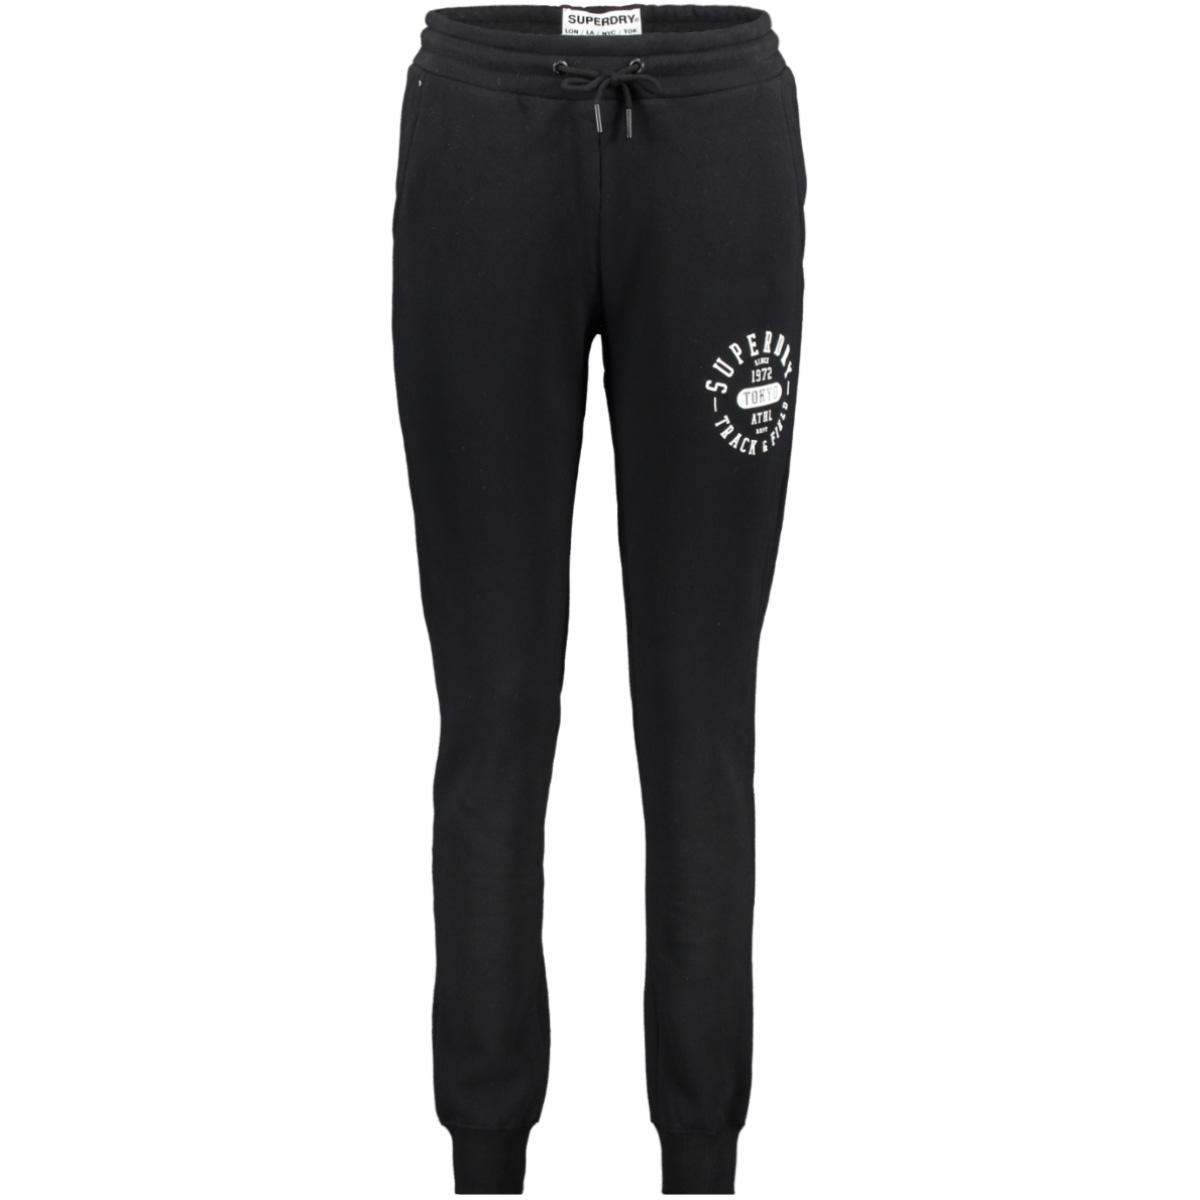 track & field jogger w7000027a superdry broek black